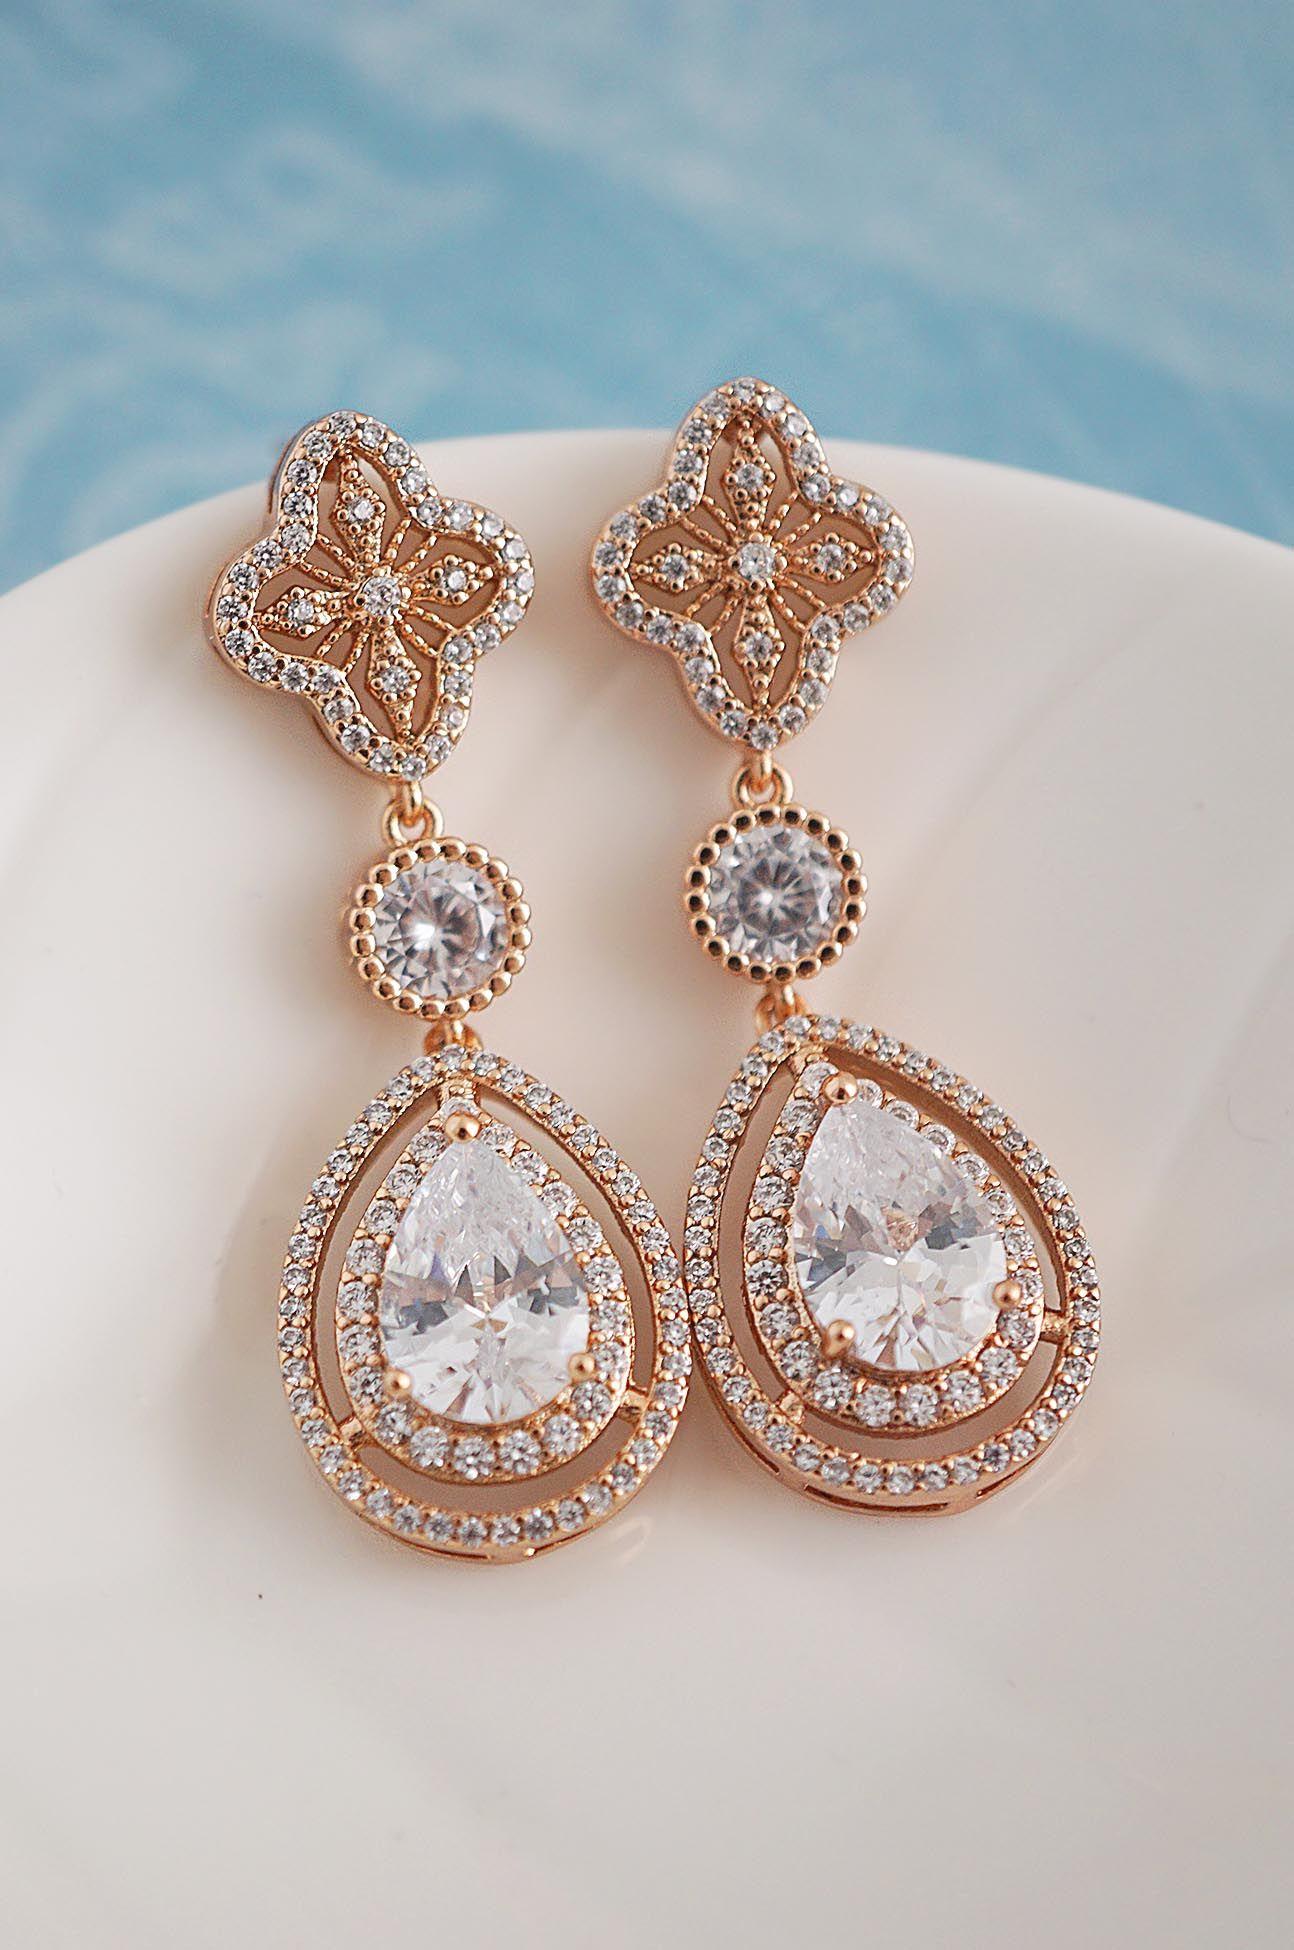 c67103fc2 Rose gold bridal earrings from Earringsnation Bridal Jewelry Rose gold  wedding blush earrings bridesmaid gift rose gold earrings